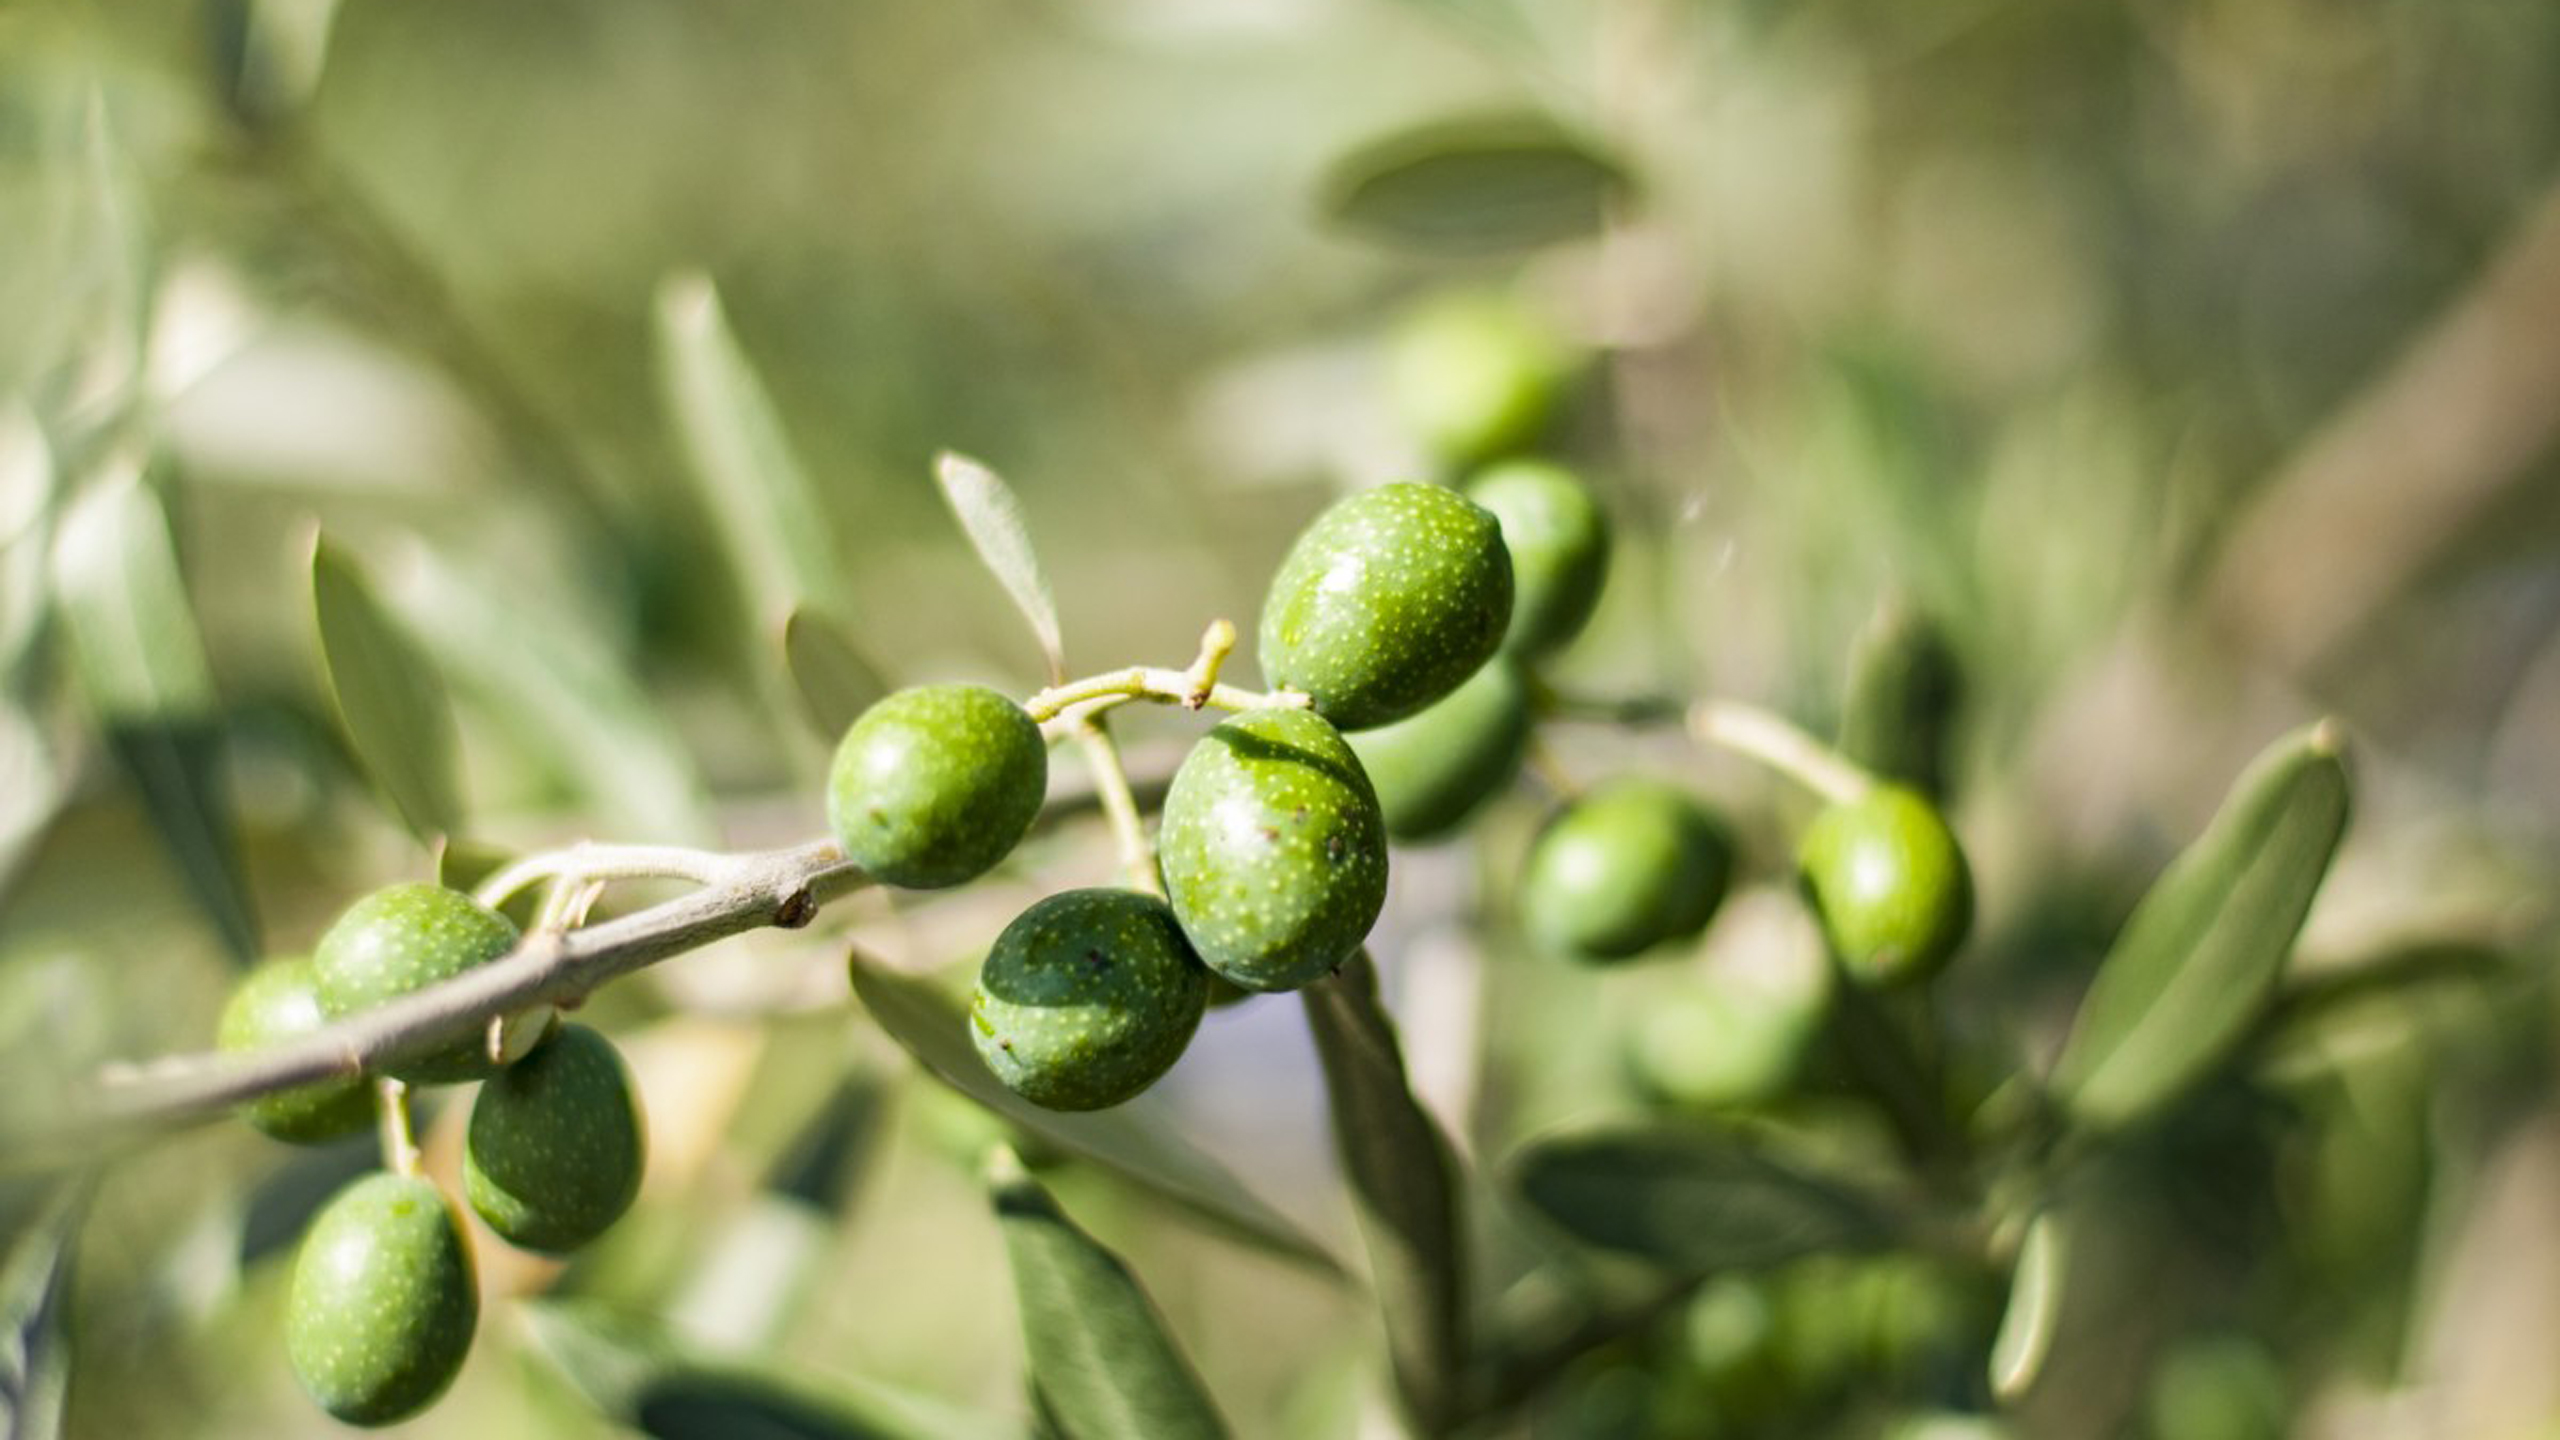 olivar español en peligro